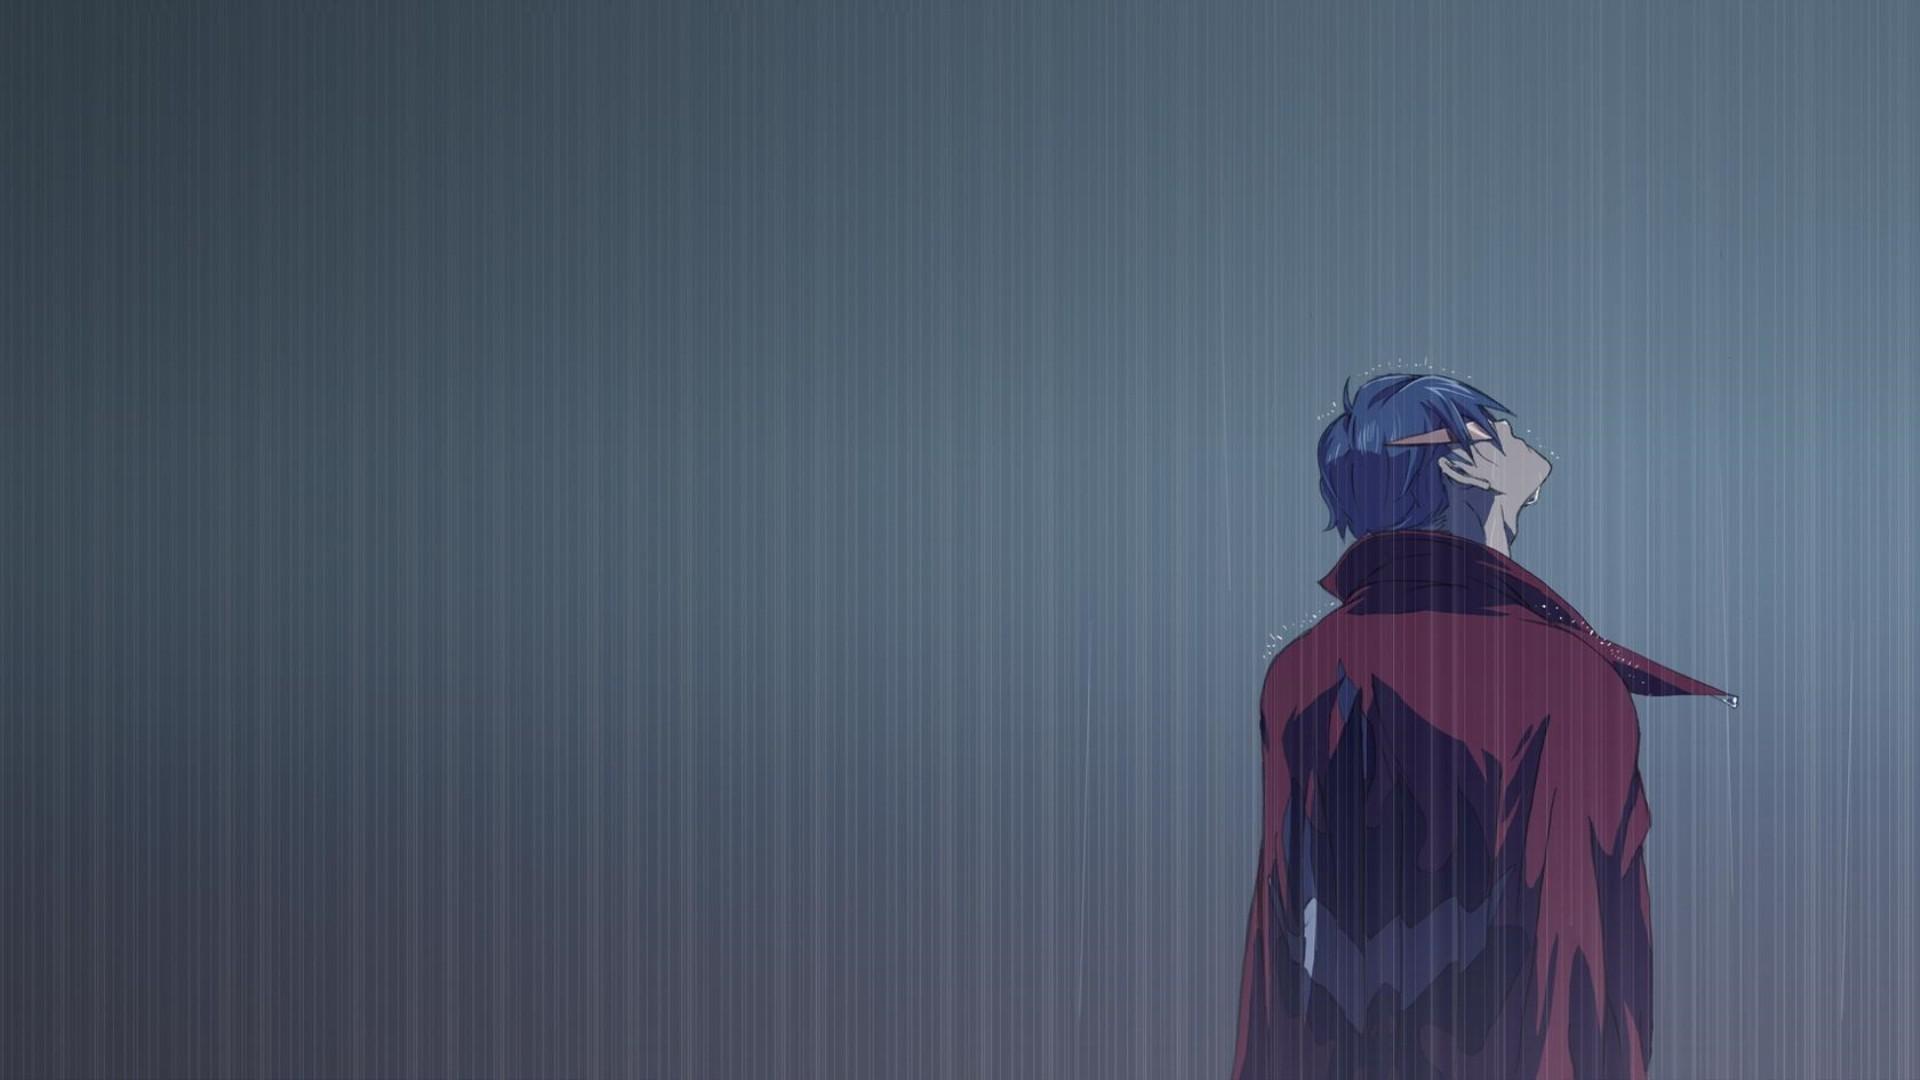 Sad Crying Girl Wallpaper Hd Wallpaper Anime Rain Blue Tengen Toppa Gurren Lagann